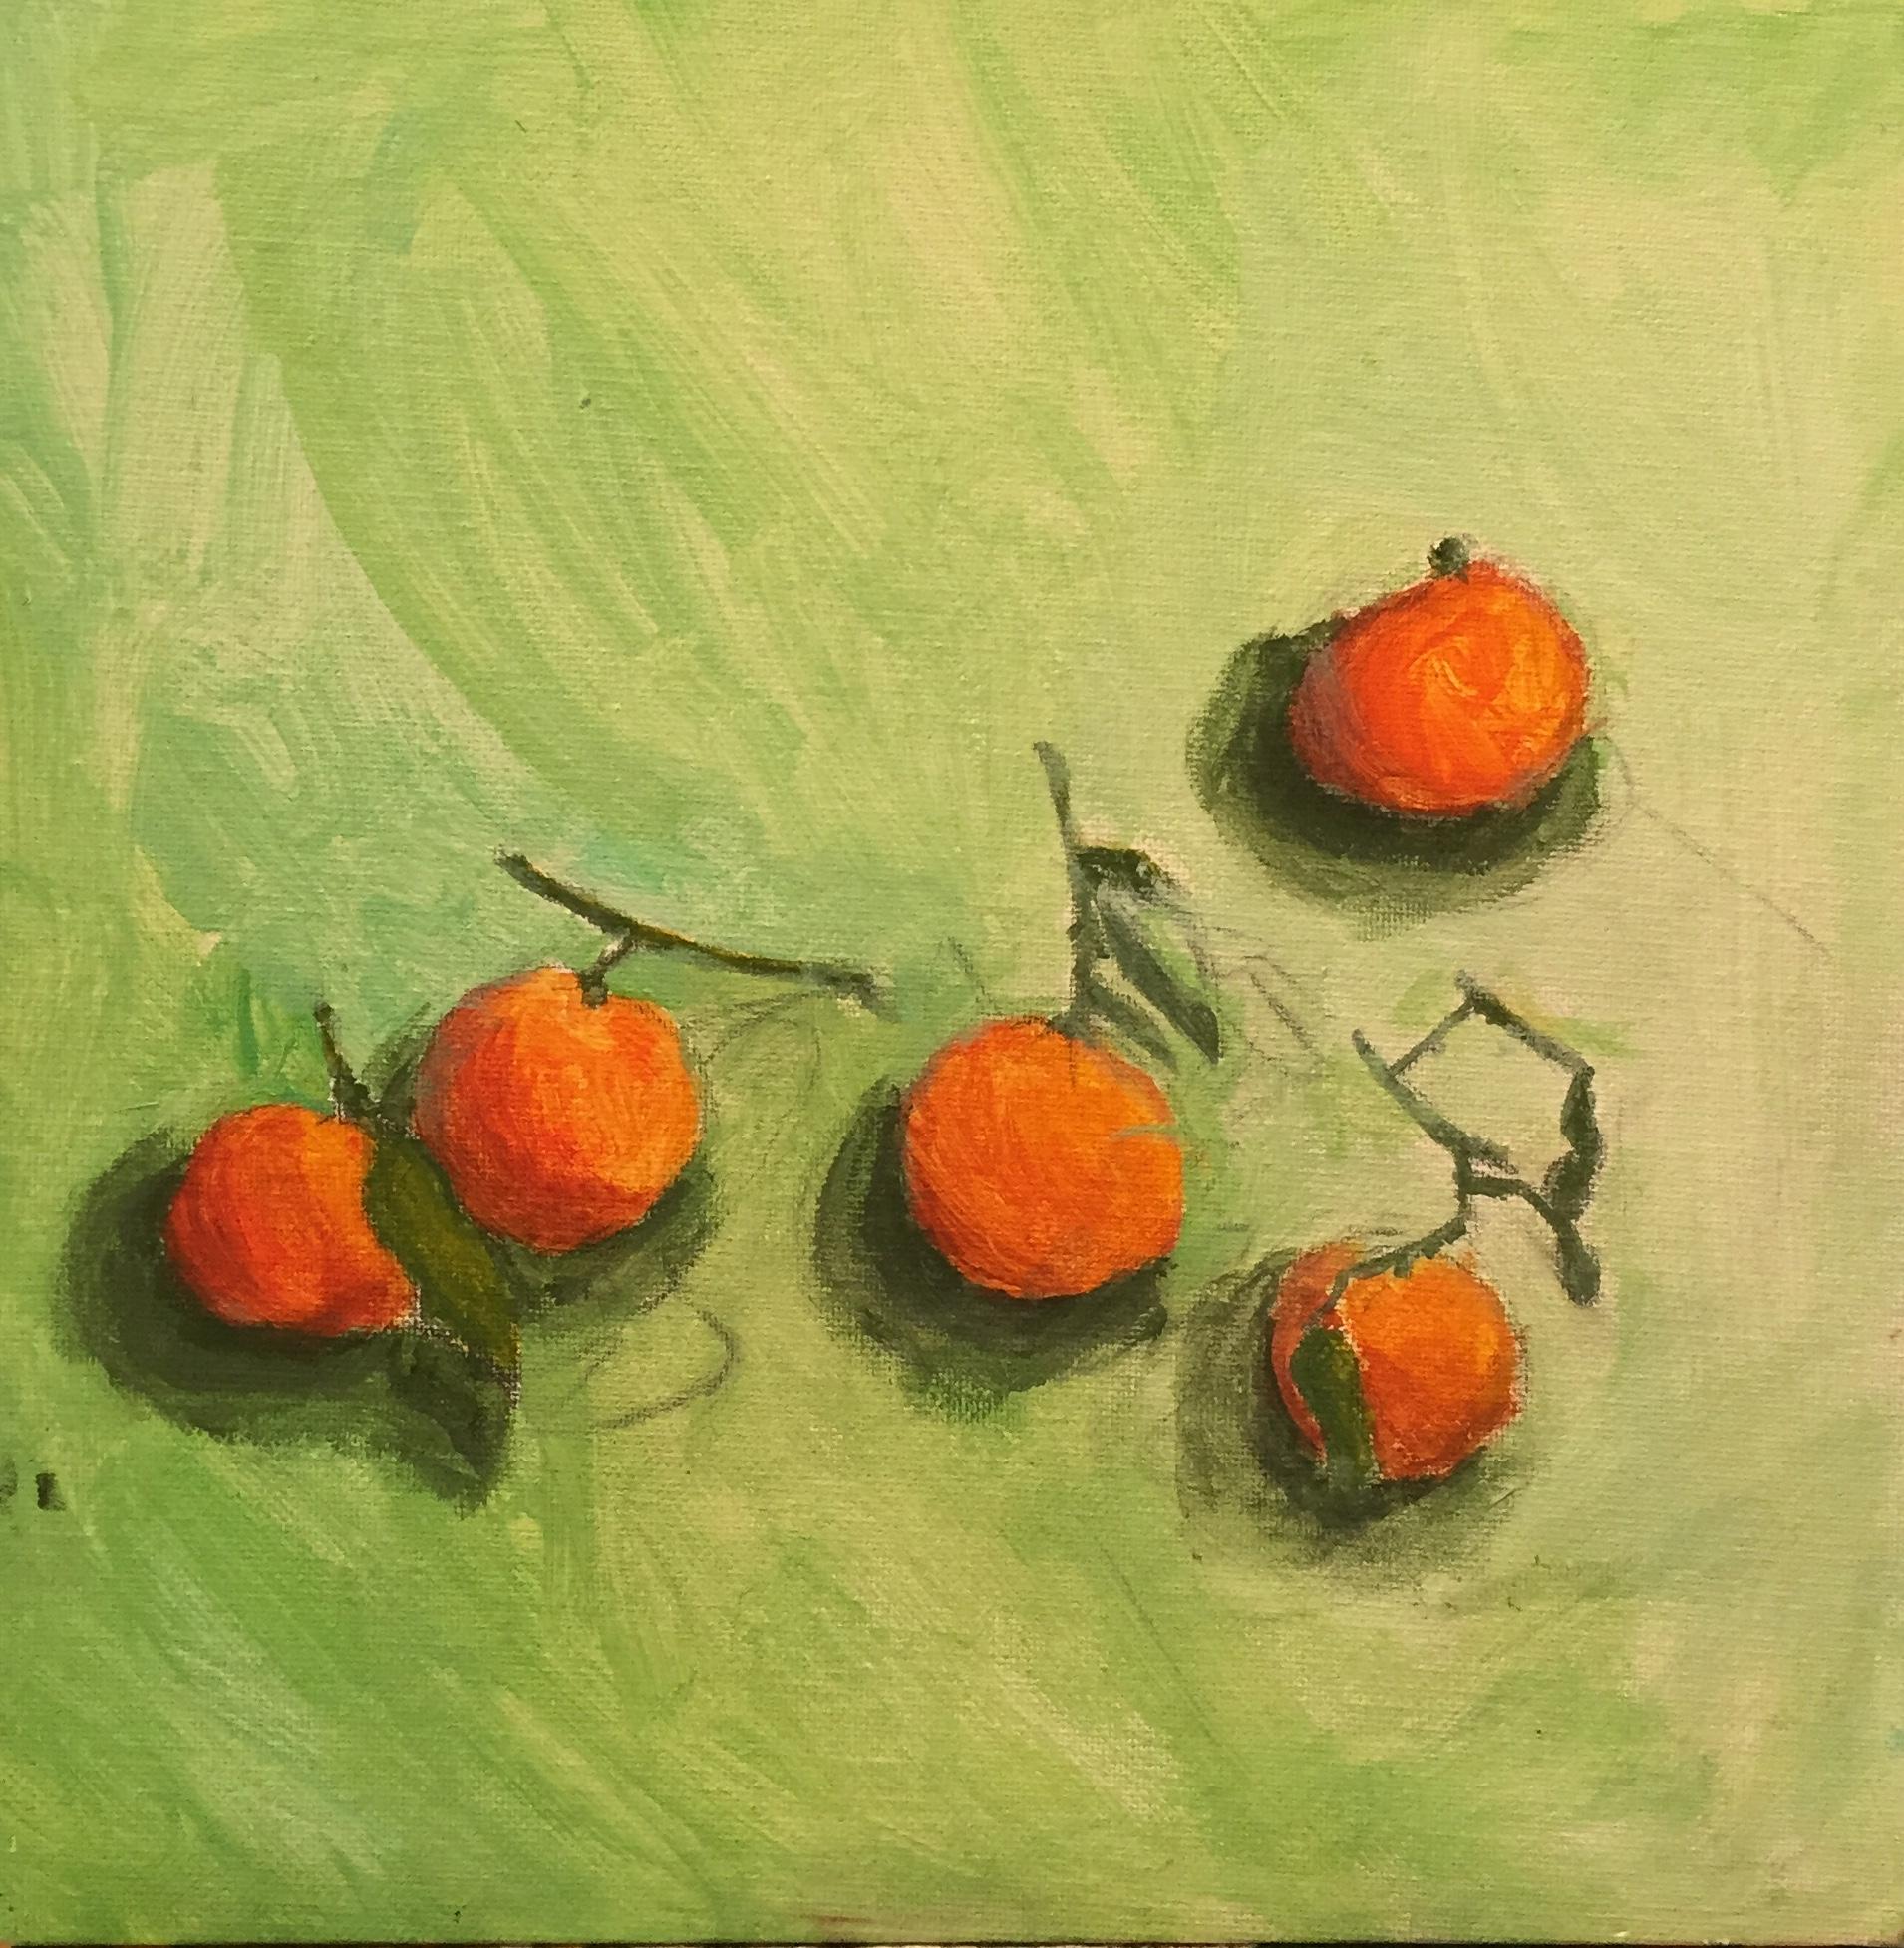 acrylic still life of oranges